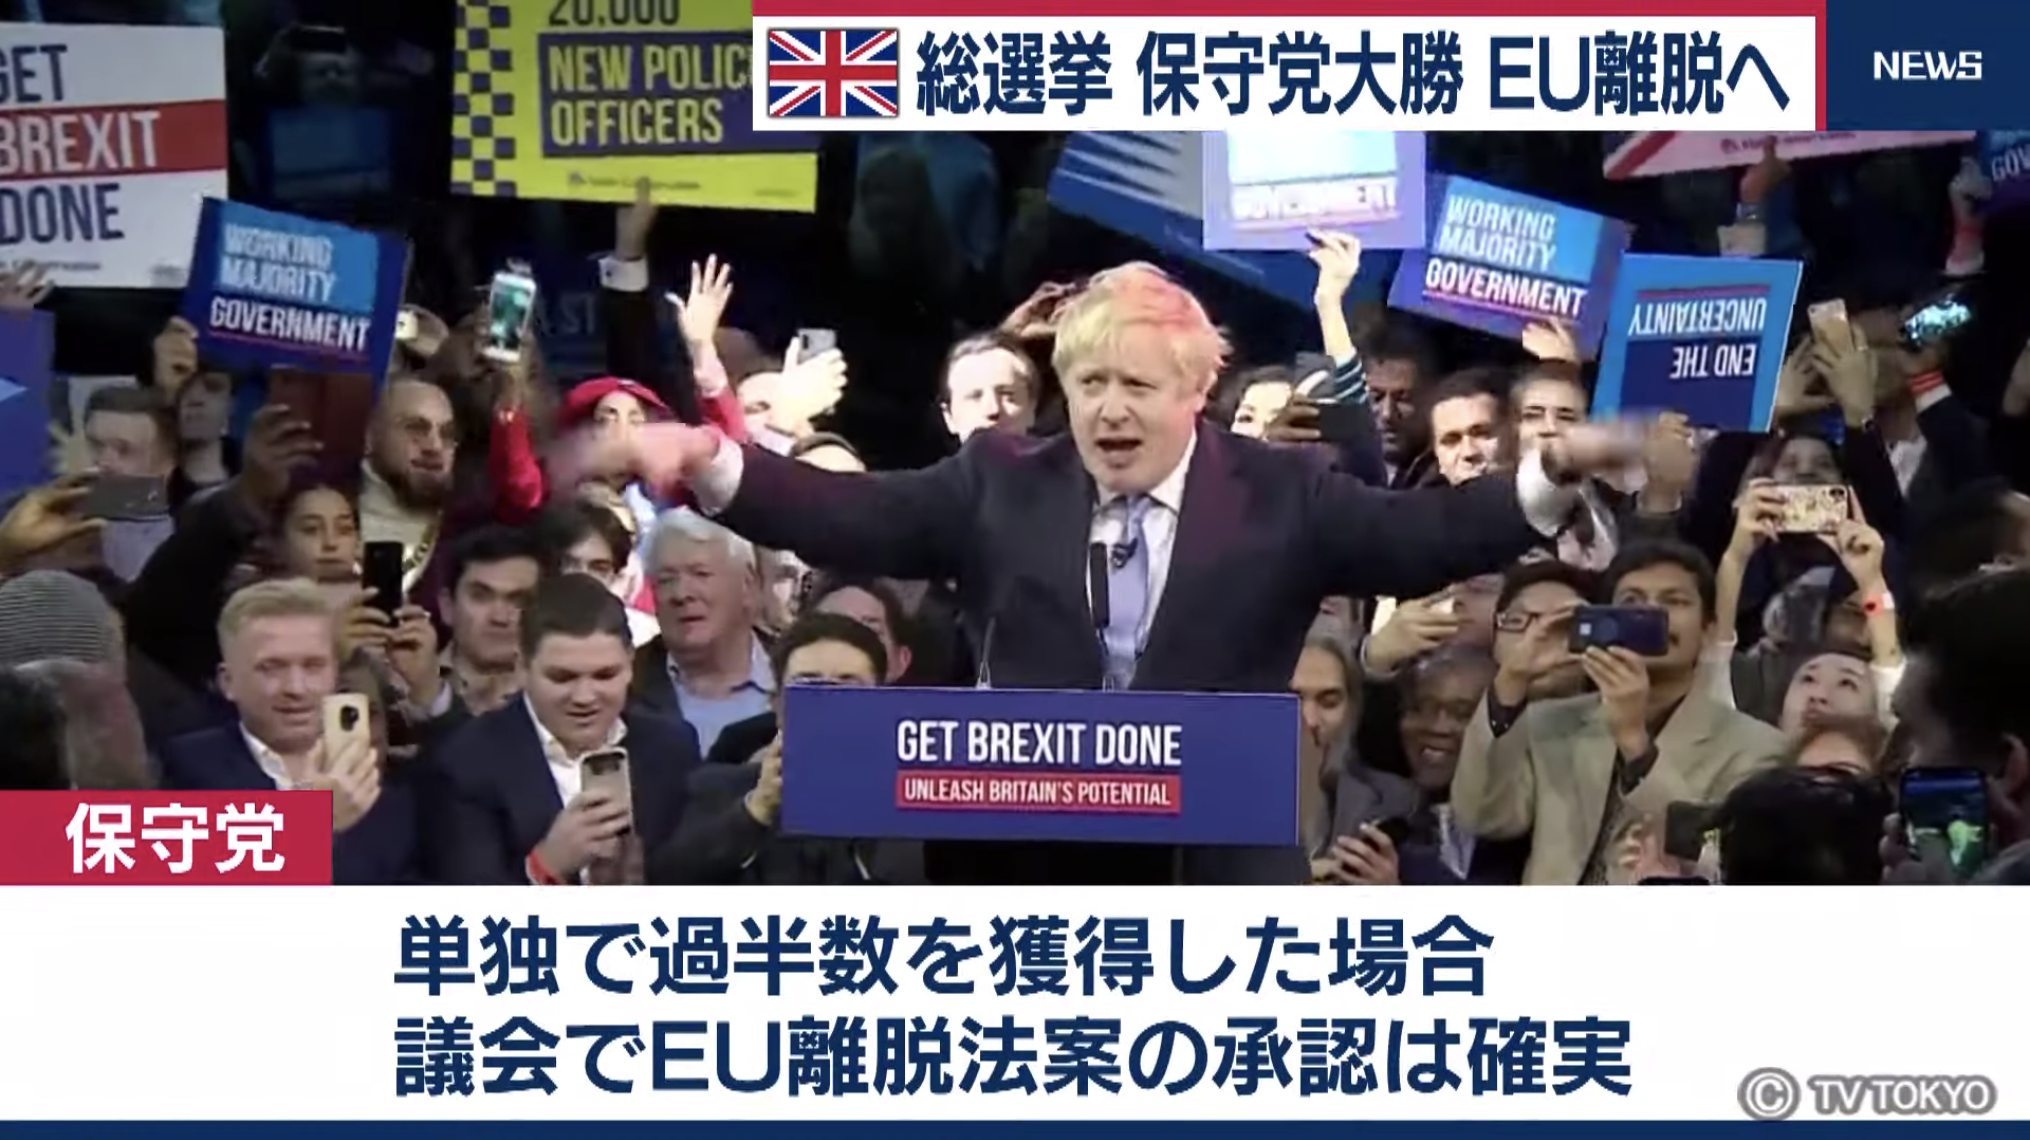 【EU離脱 決定的】英総選挙で保守党が歴史的大勝へ